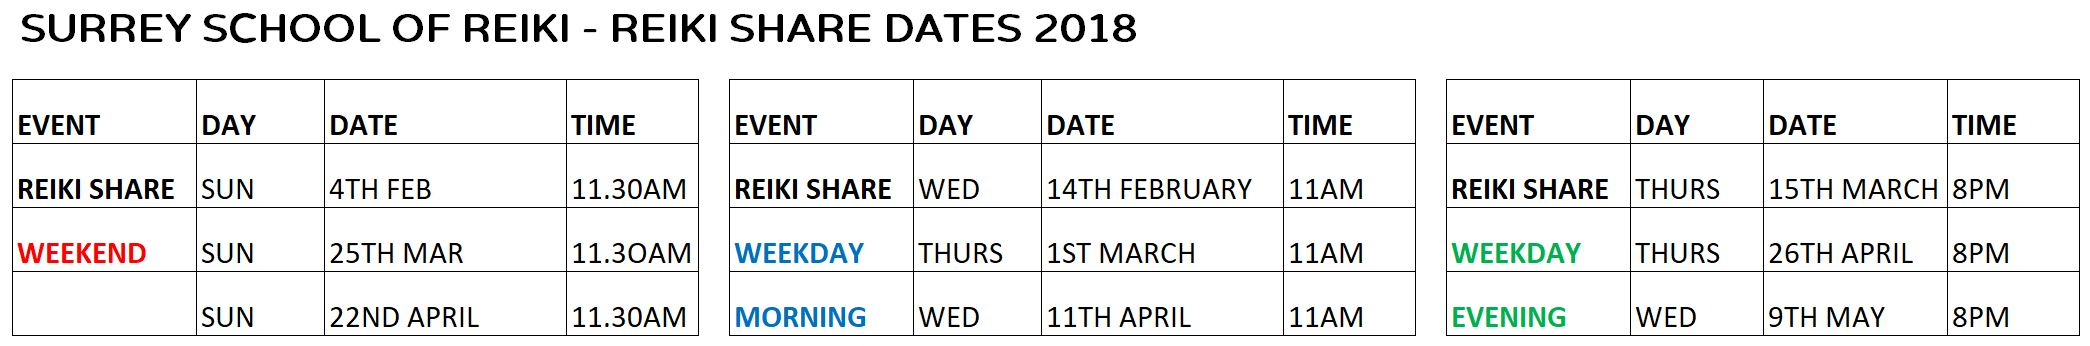 REIKI SHARE DATES 2018 Surrey School of Reiki.JPG